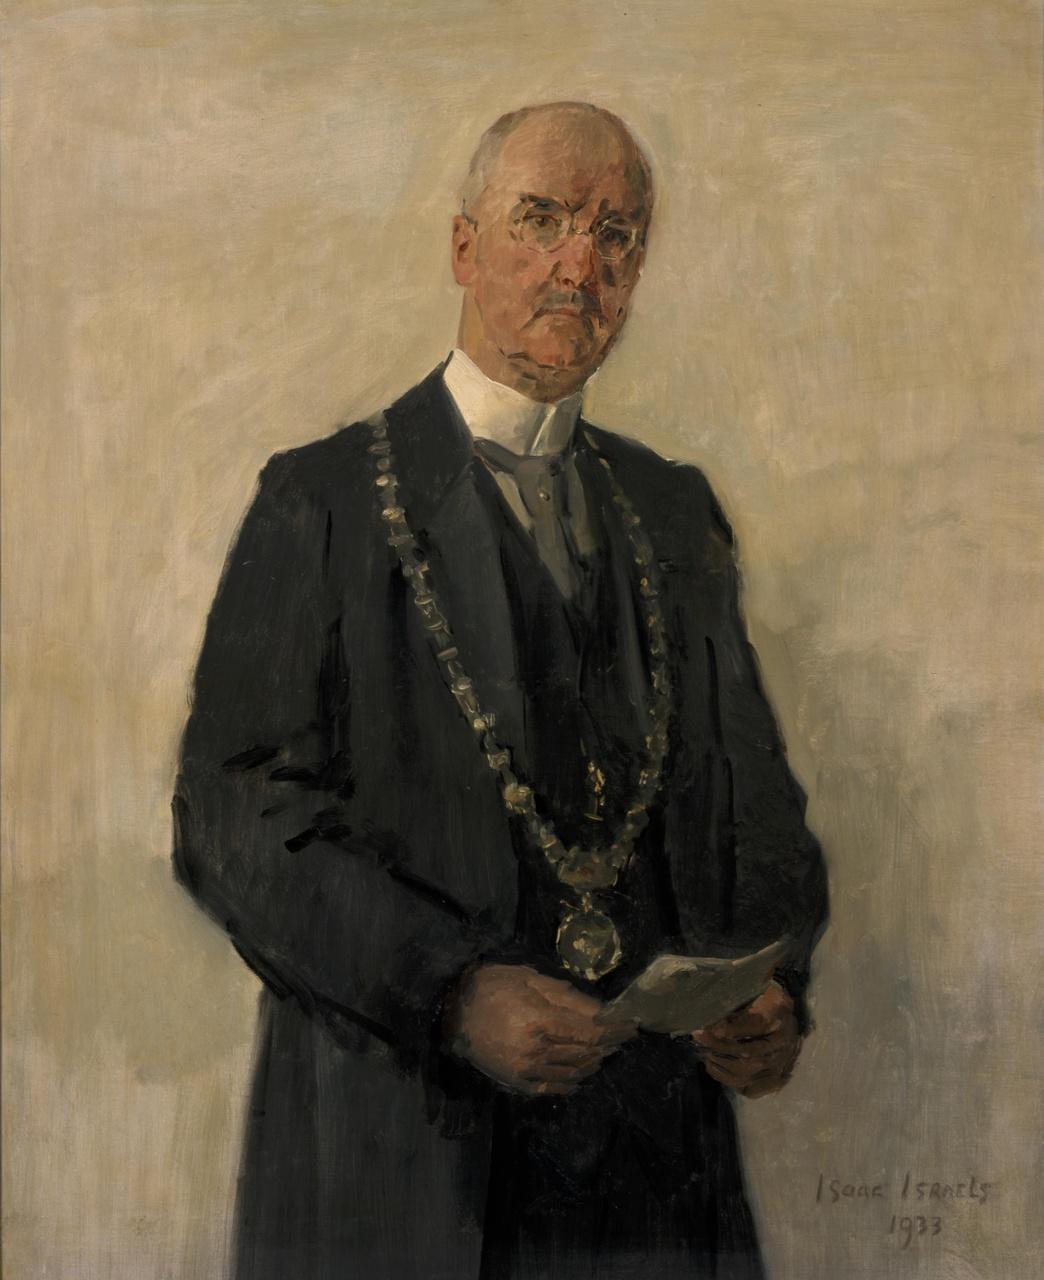 Portret van burgemeester dr. J.P. Fockema Andreae